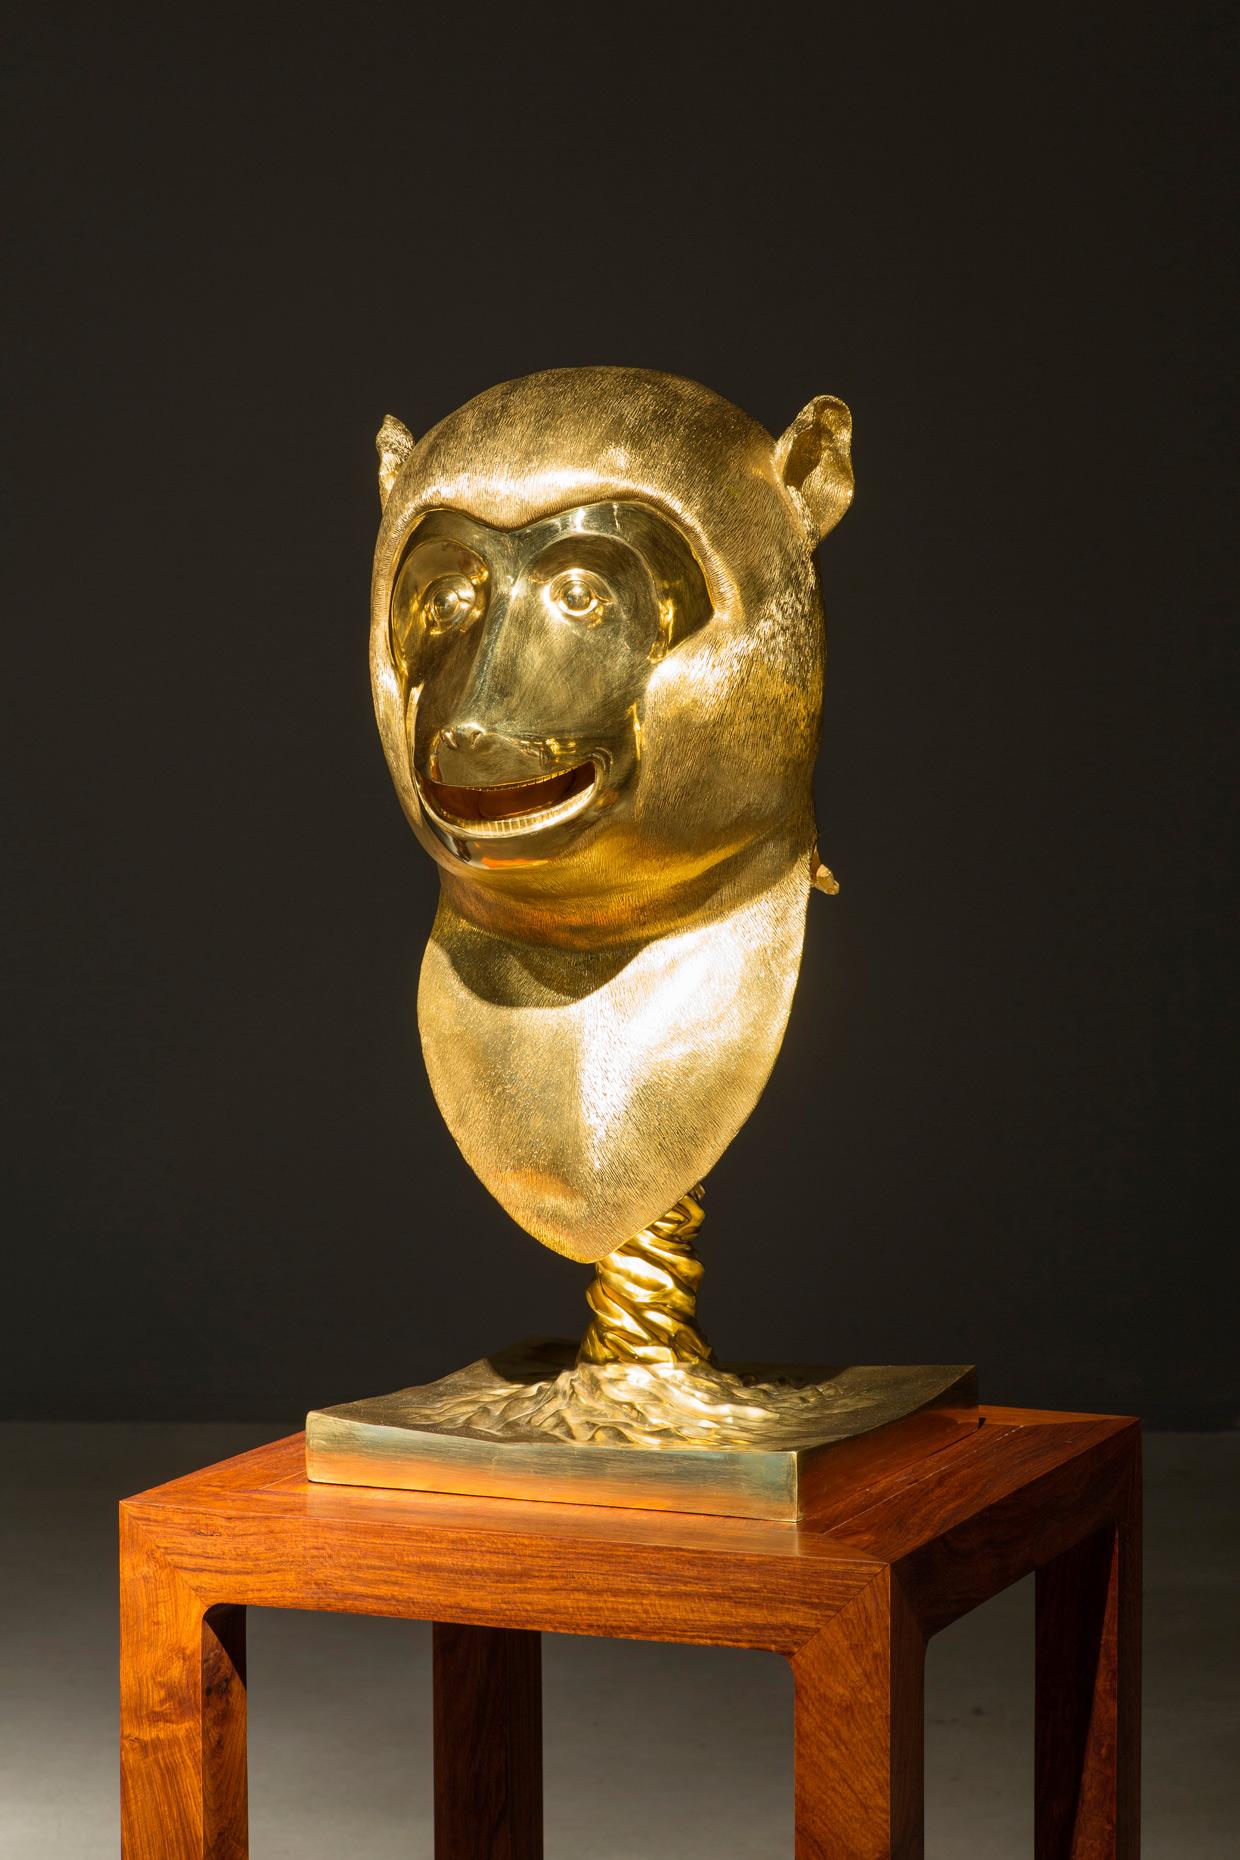 Ai Weiwei, Circle of Animals/Zodiac Heads, 2010. (Monkey) Photo Anders Sune Berg